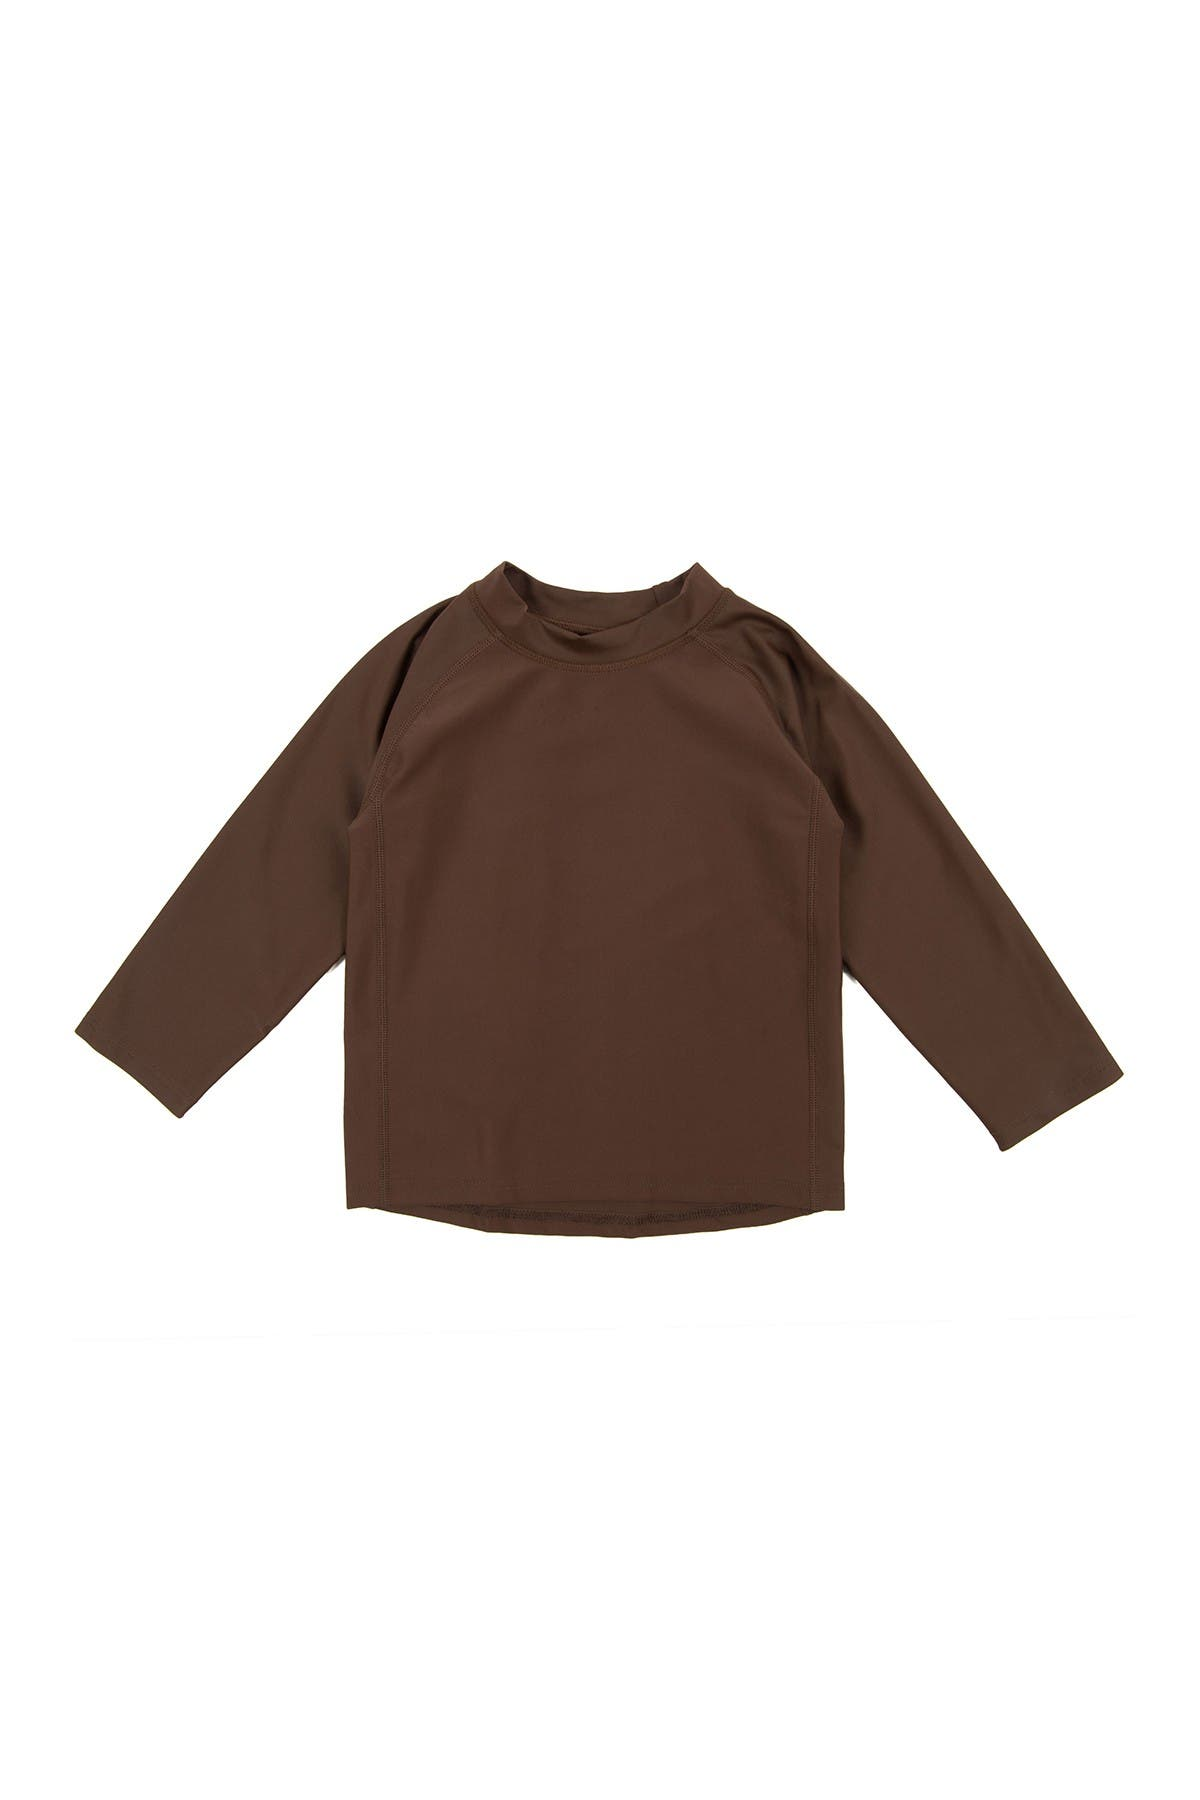 Image of Leveret Long Sleeve UPF +50 Rash Guard - Brown